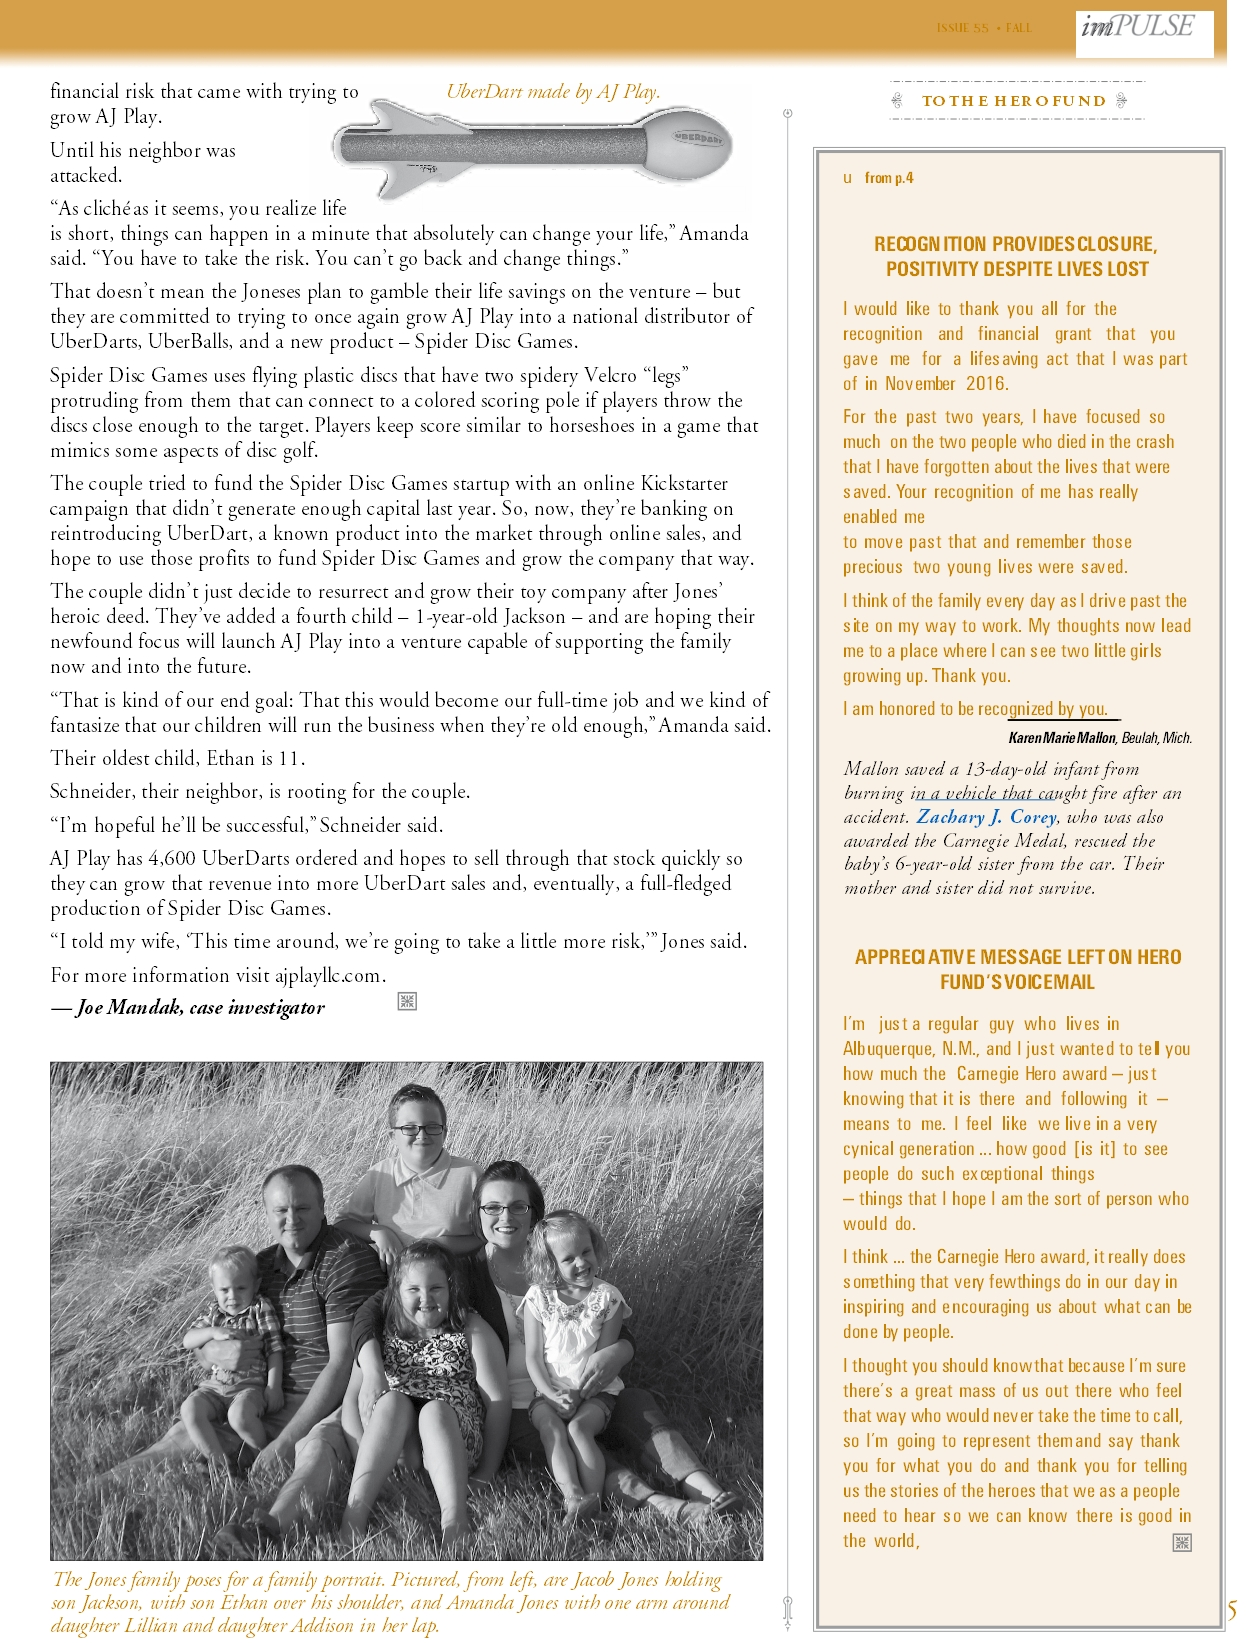 Carnigie Article page 2.jpg